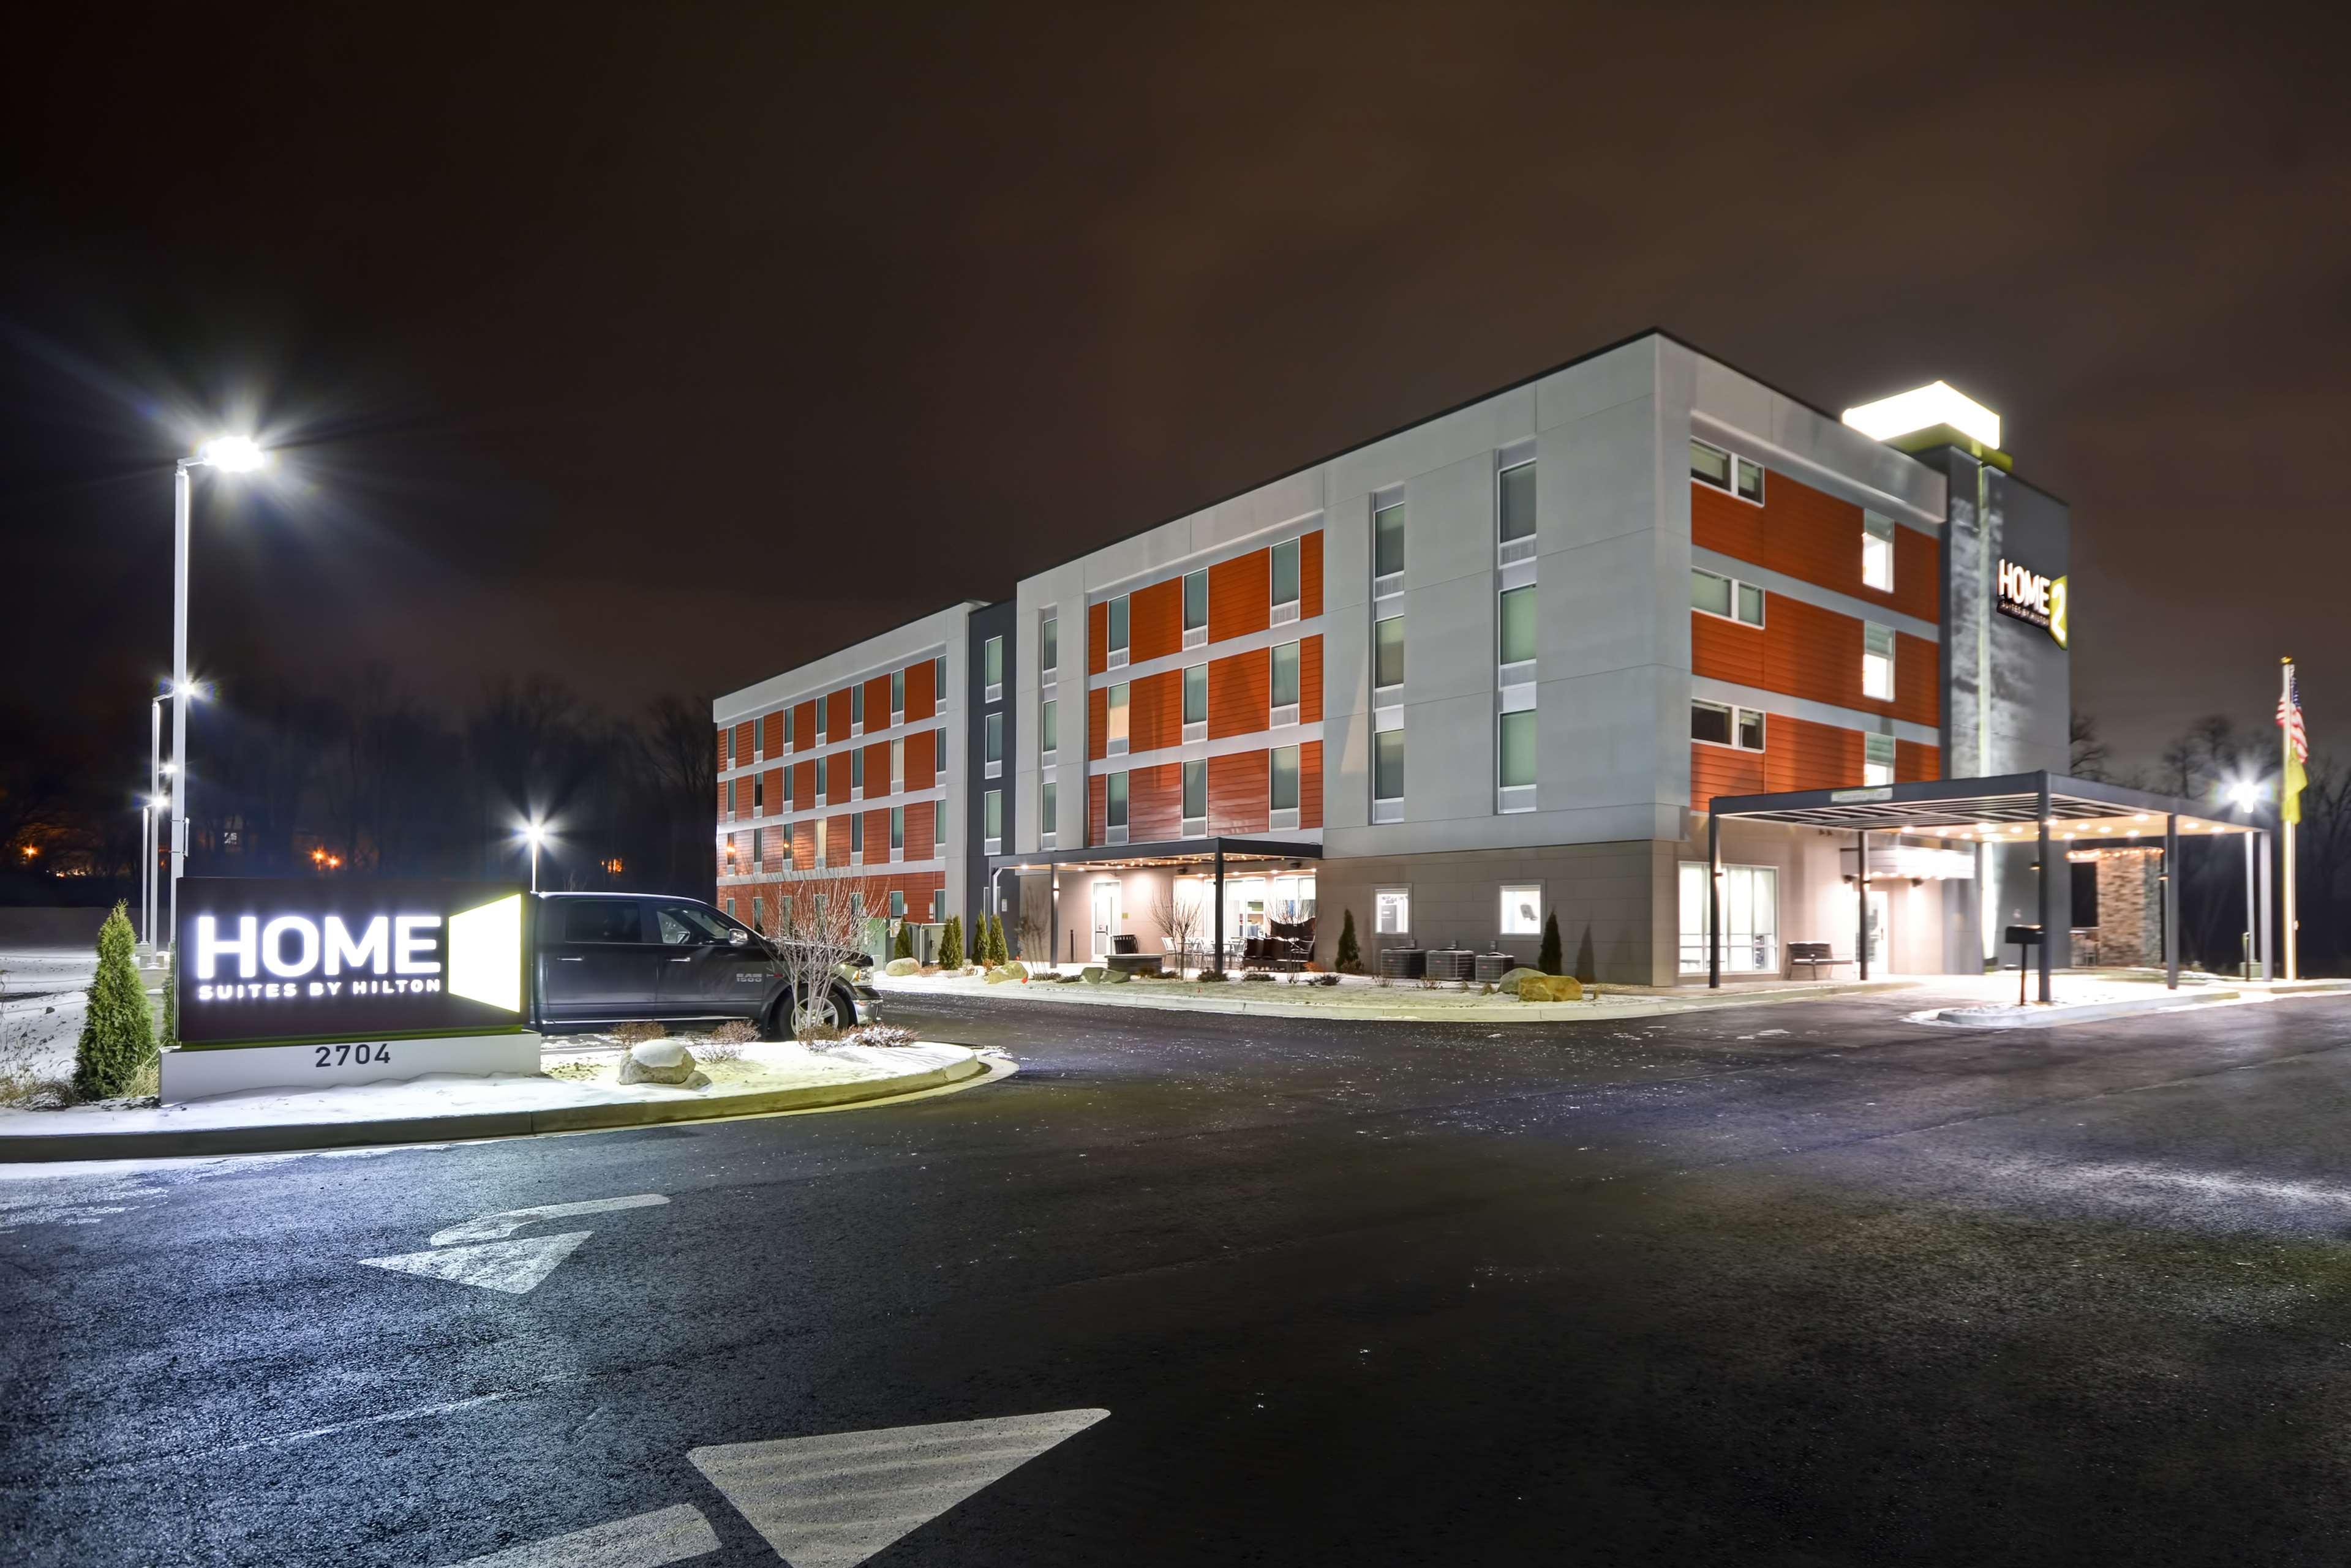 Home2 Suites by Hilton Jackson image 0